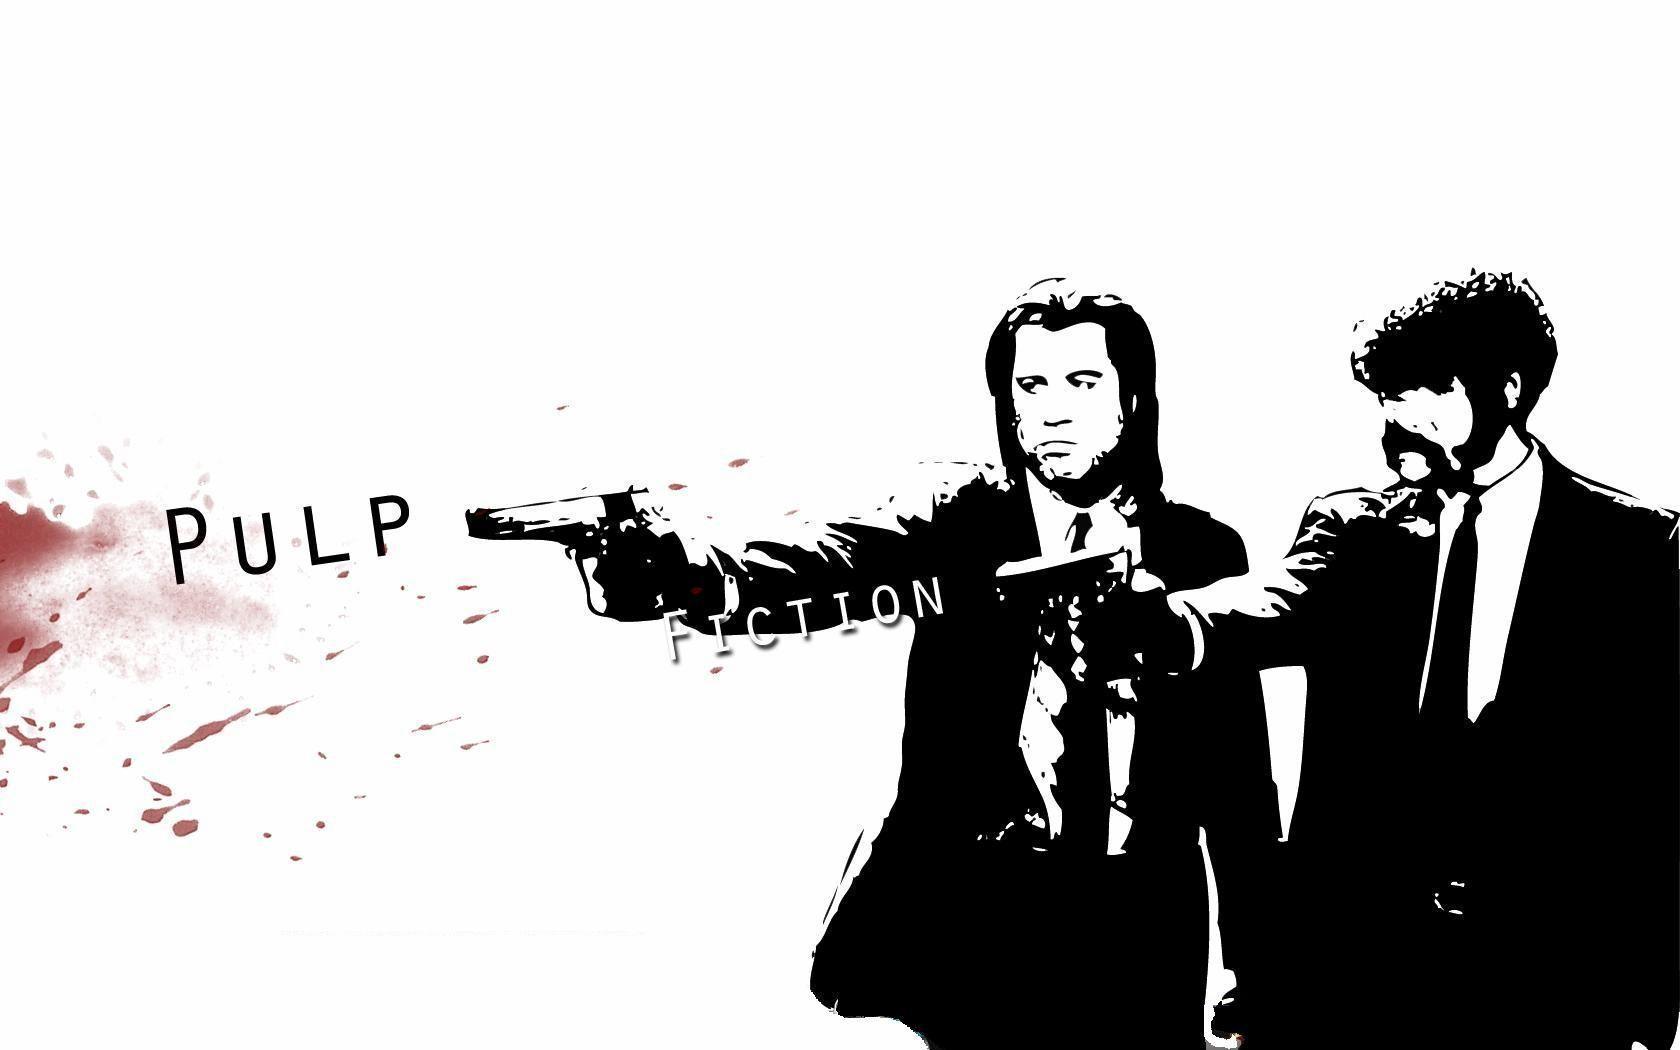 Pulp Fiction Wallpapers  Wallpaper Cave